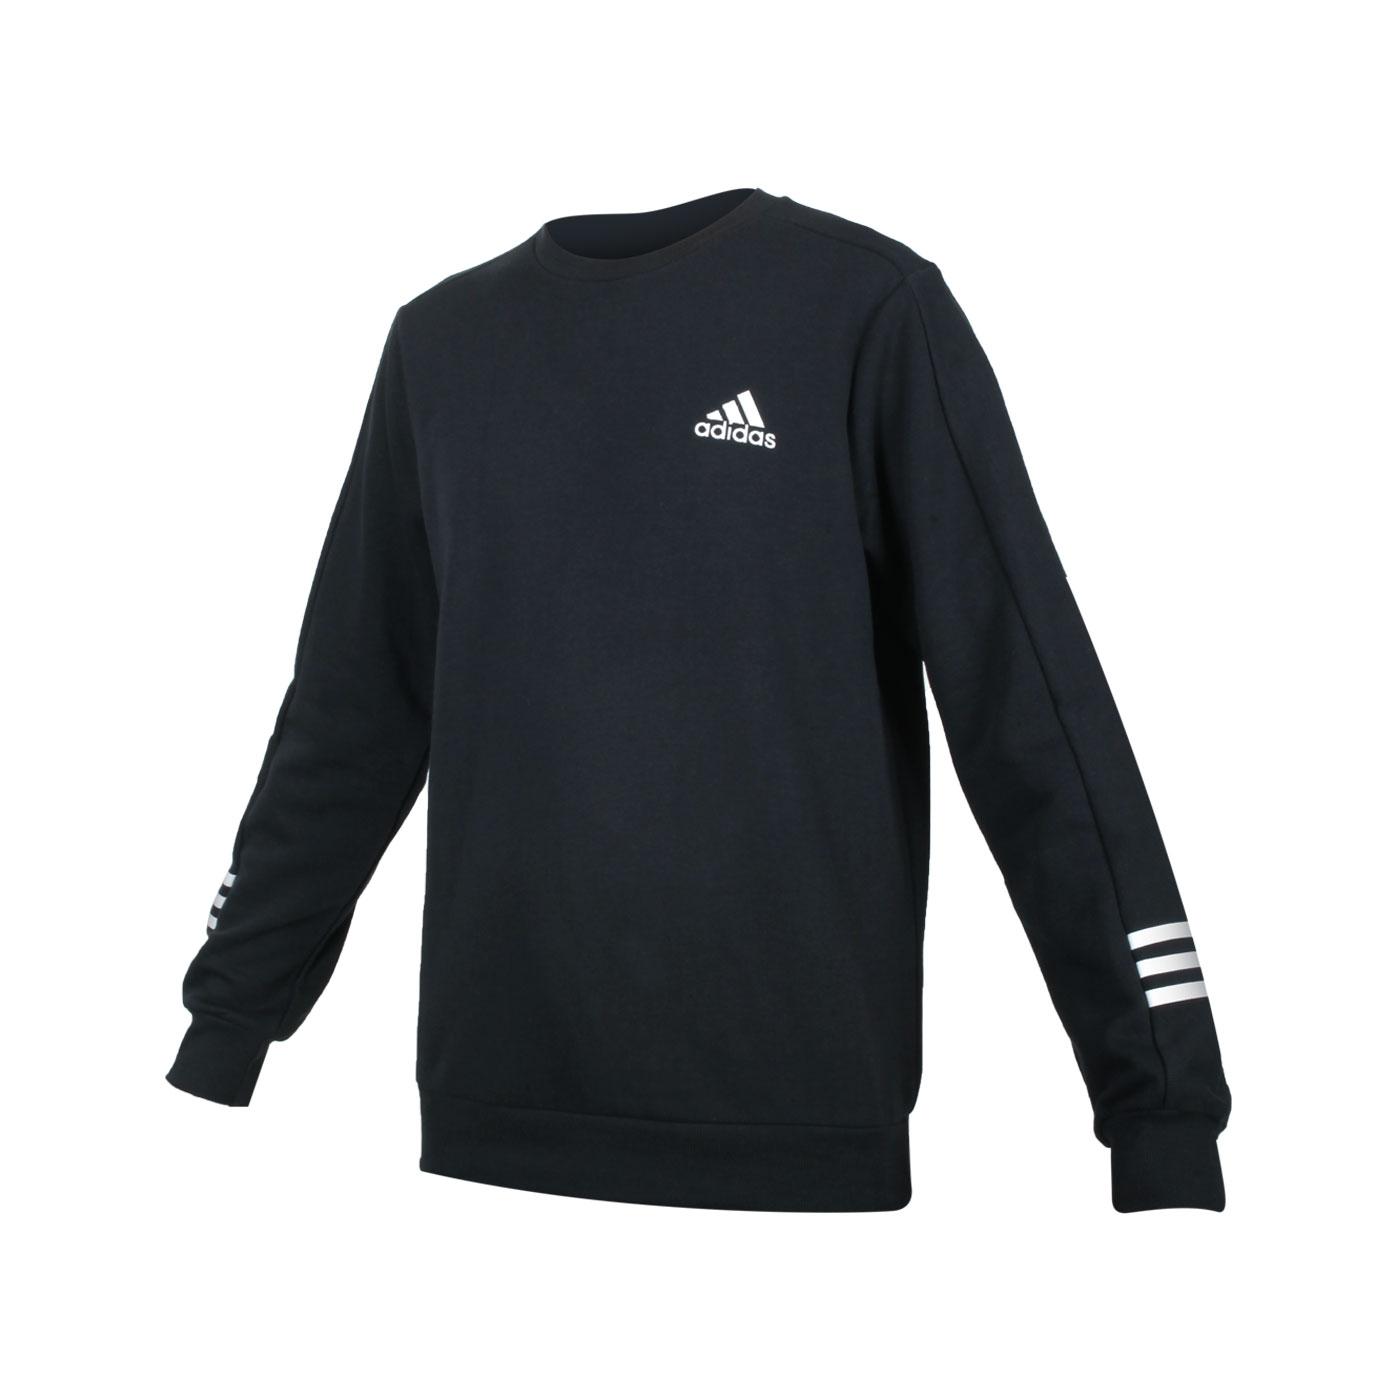 ADIDAS 男款圓領長袖T恤 GD5467 - 黑白